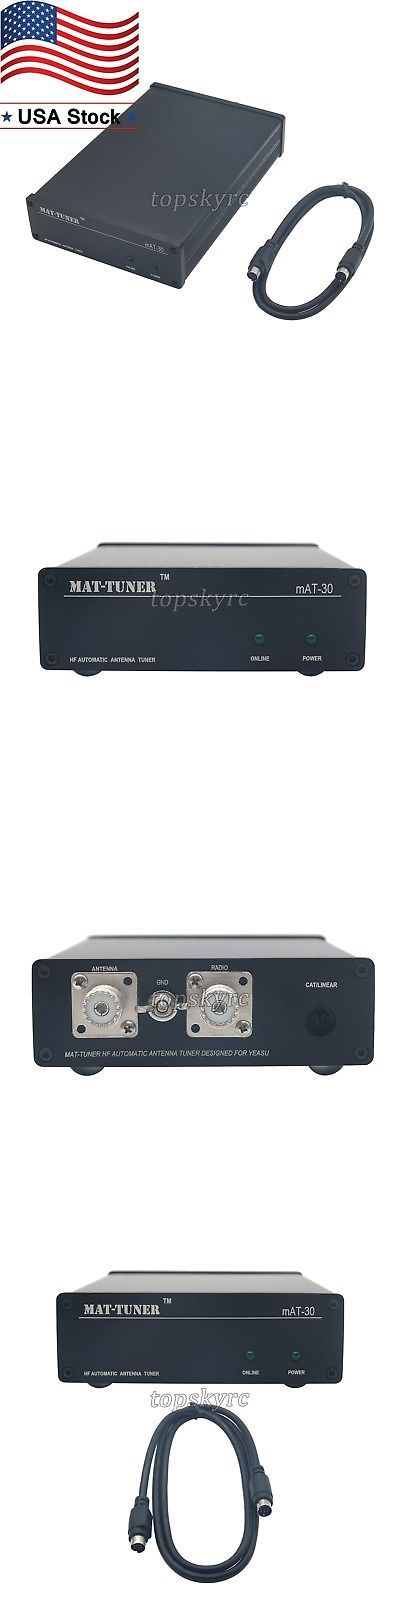 Tuners: Mat-30 Hf Ham Radio Auto-Tuner 120W Auto Tuner Automatic Antenna For Yeasu Us -> BUY IT NOW ONLY: $169.9 on eBay!